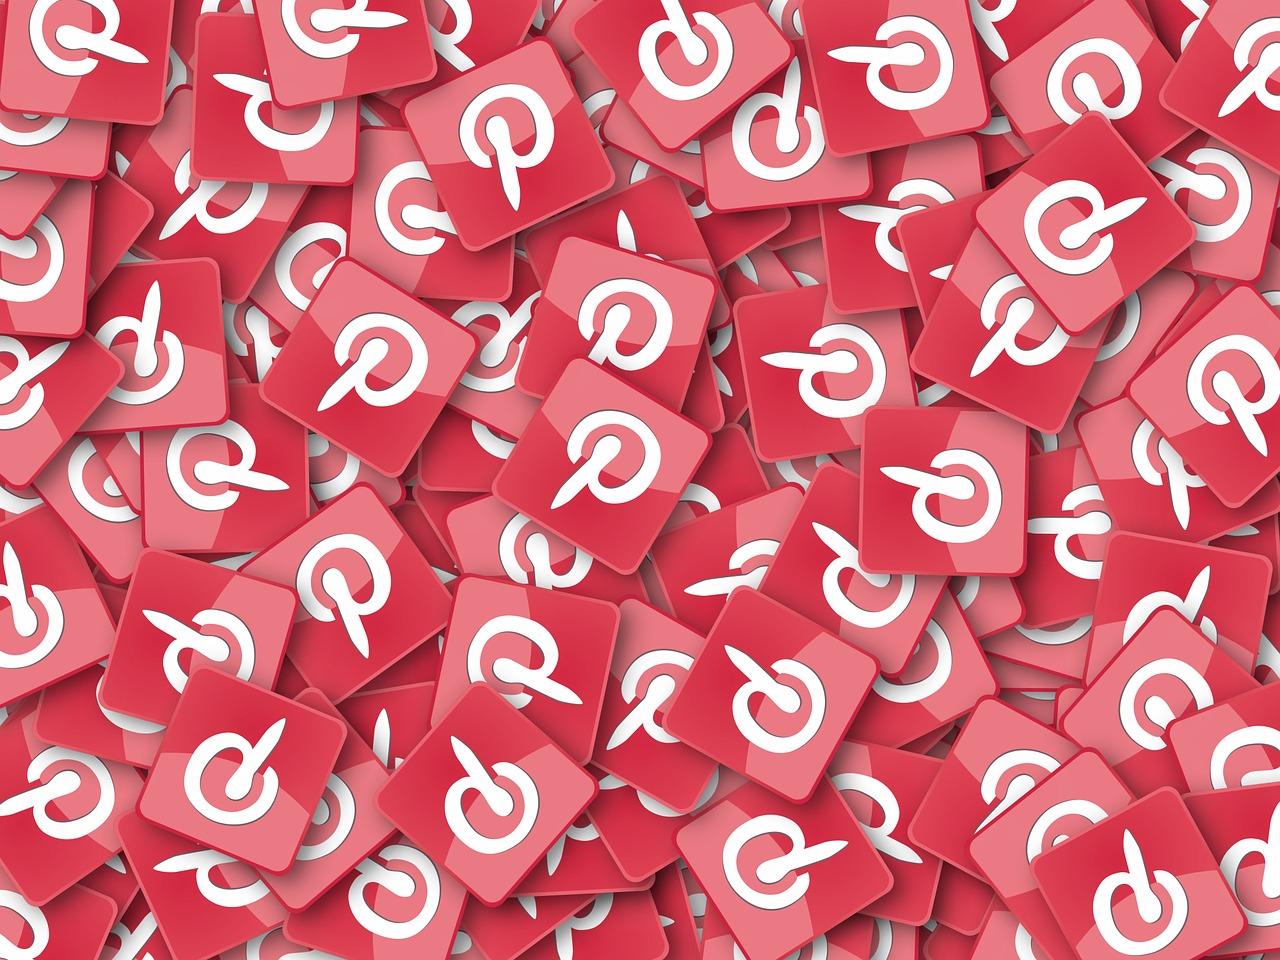 Pin Storia su Pinterest